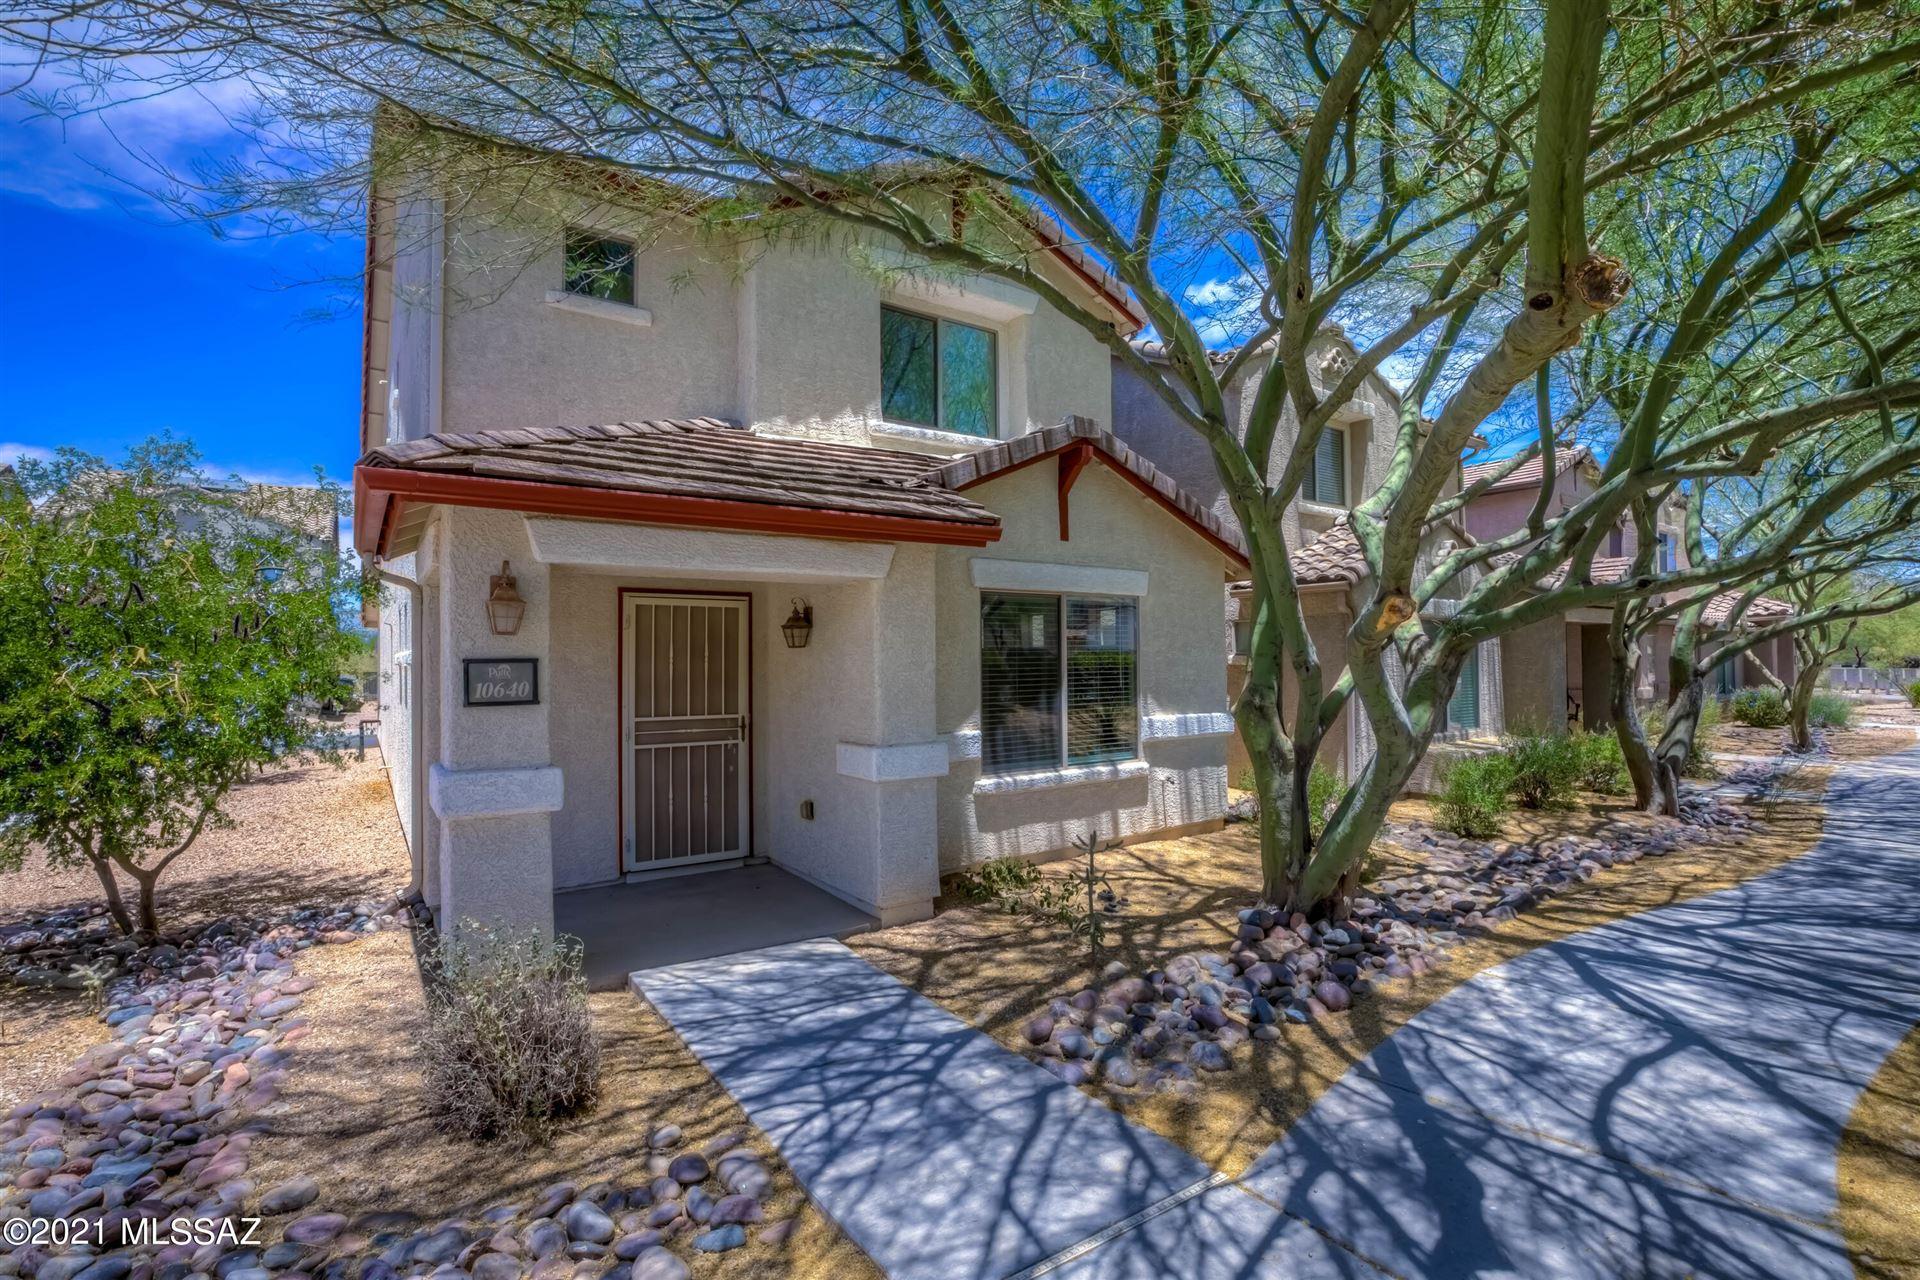 10640 E Singing Canyon Drive, Tucson, AZ 85747 - MLS#: 22115157